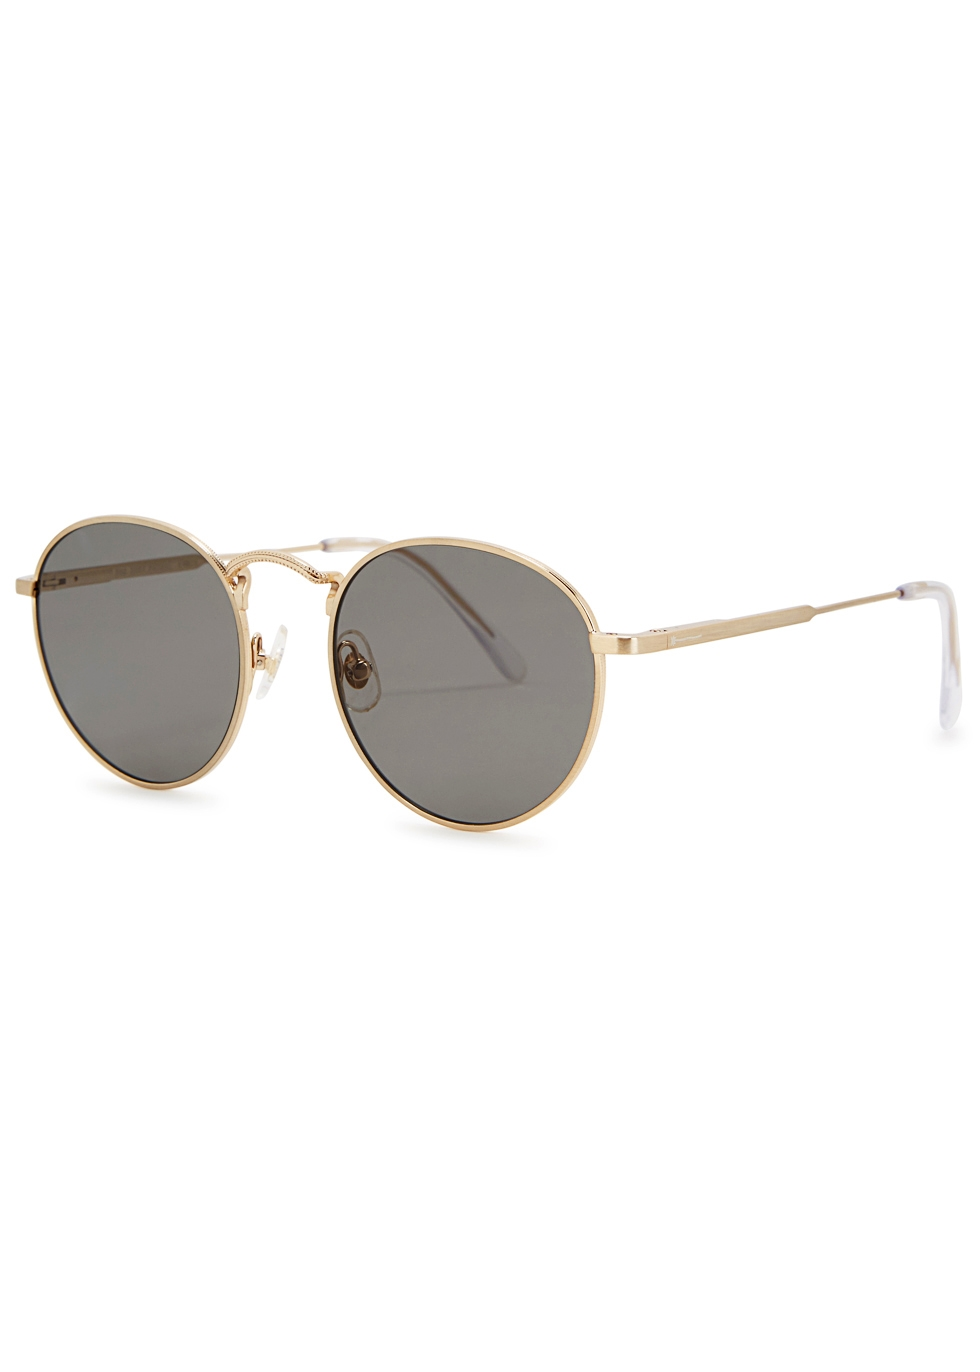 Crap Tuff Patrol The Frame Eyewear Round Sunglasses Nichols Harvey wFAqrwCx